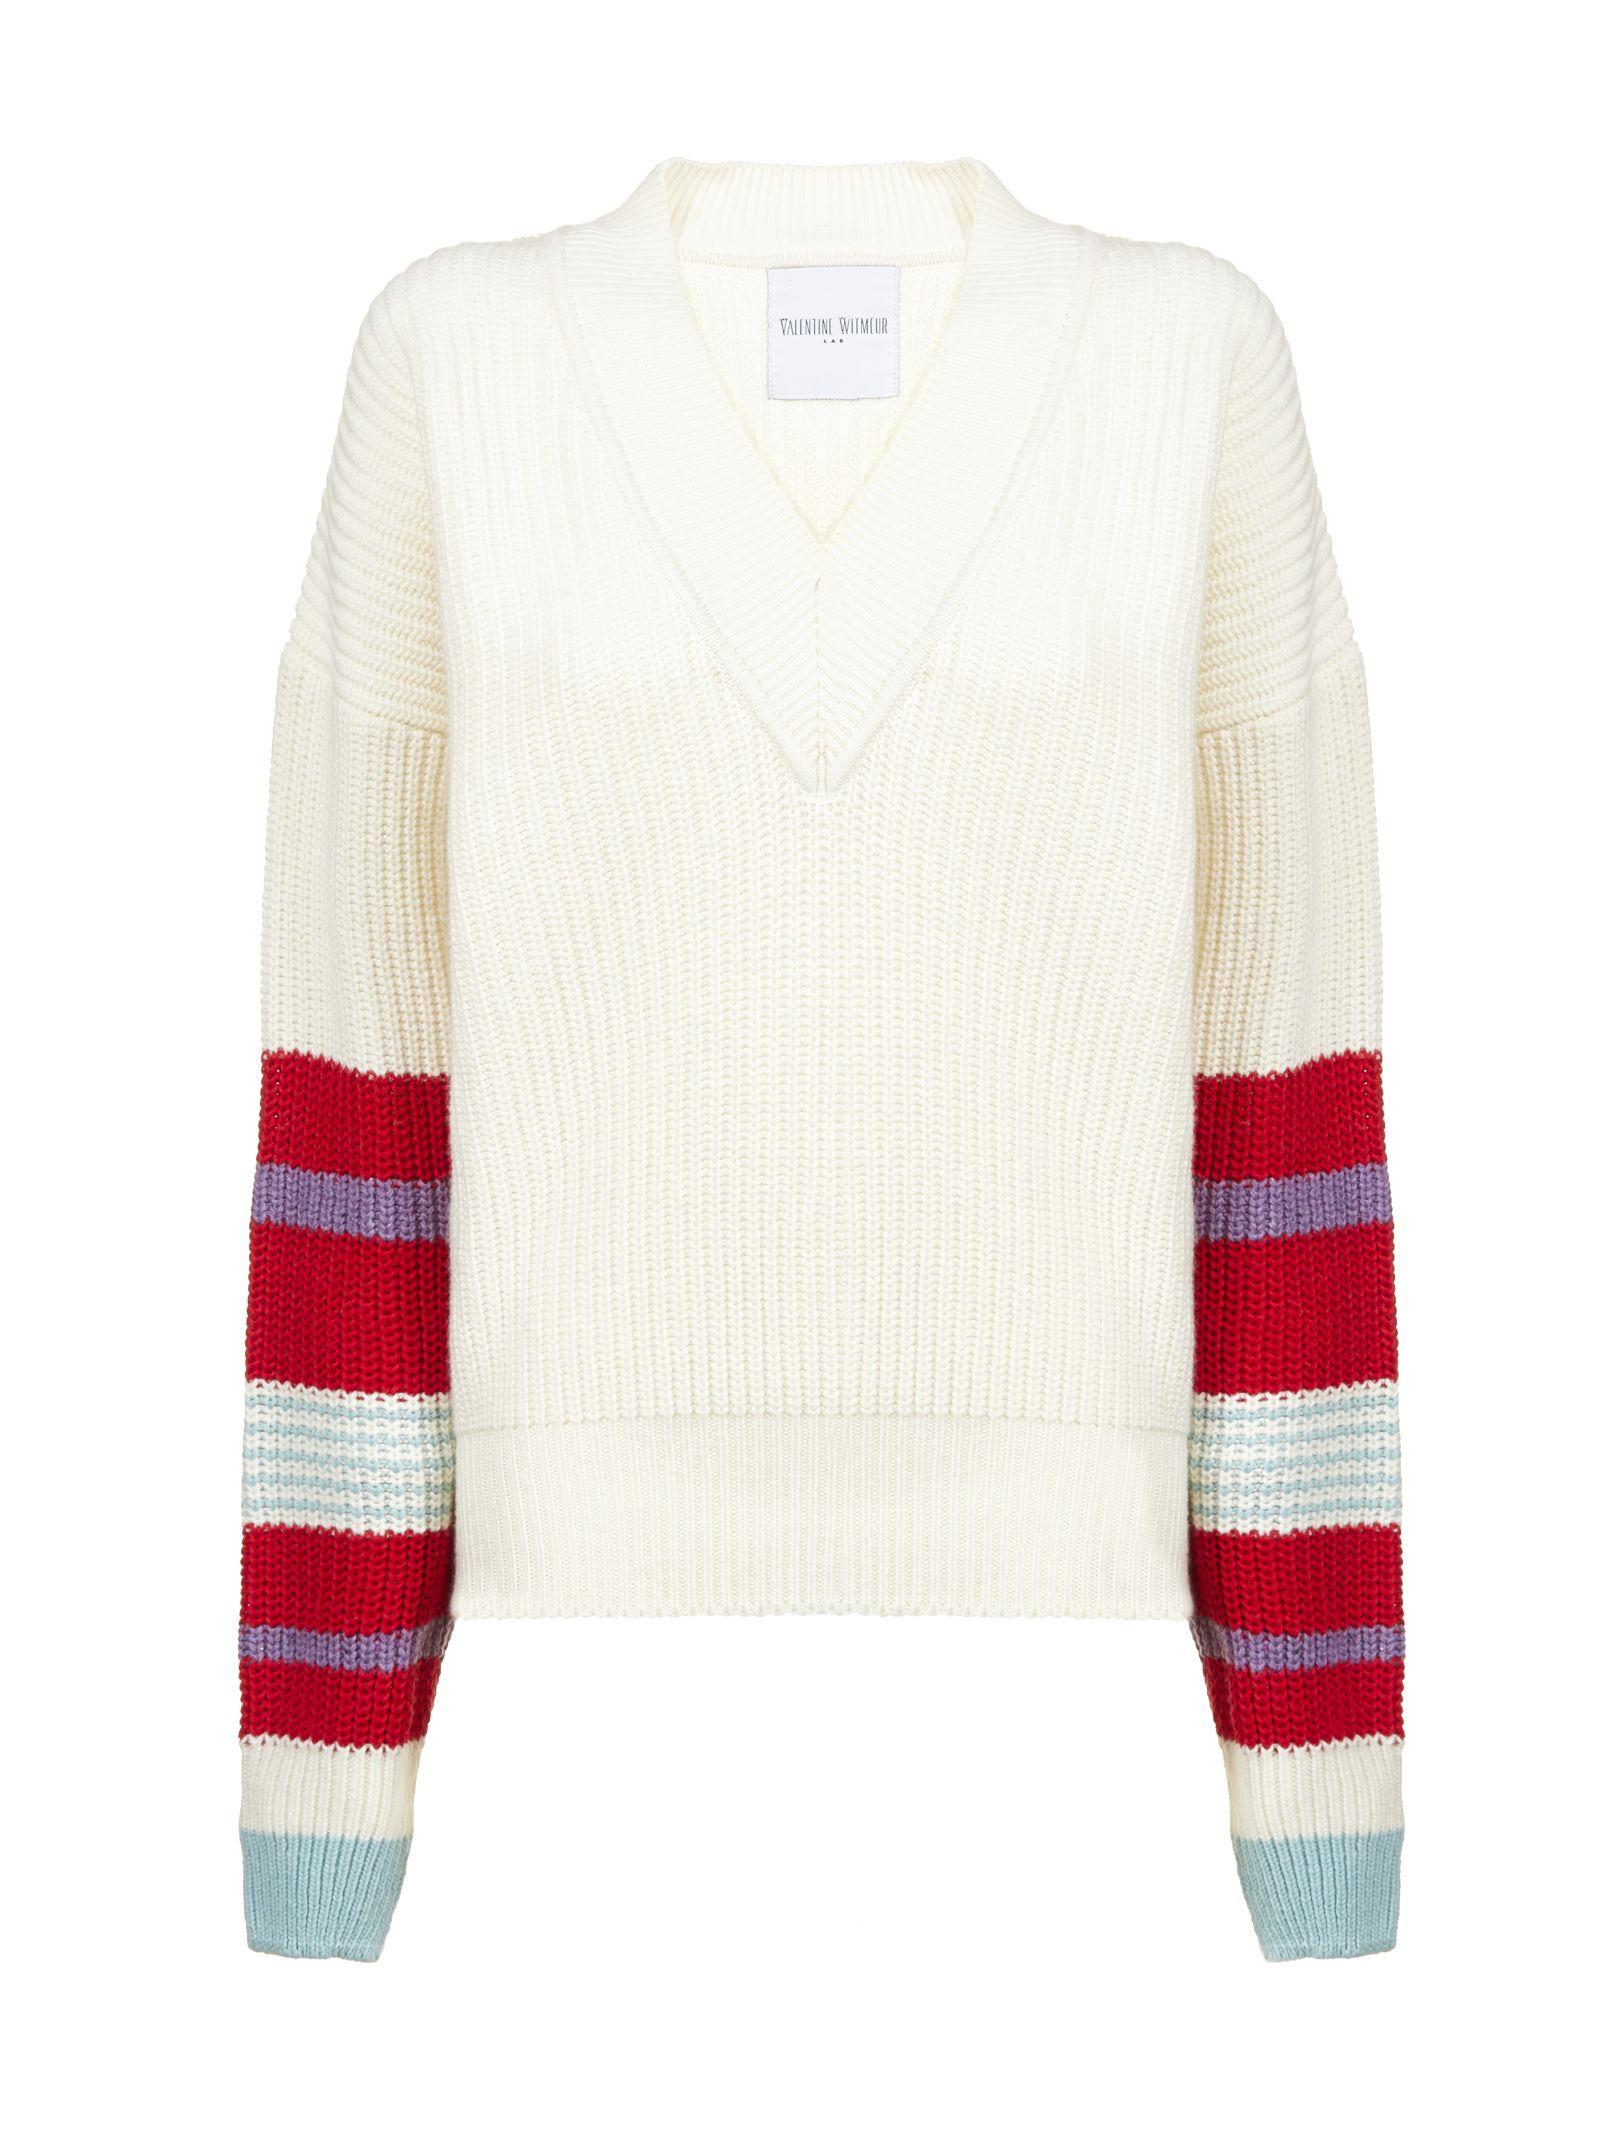 VALENTINE WITMEUR LAB Valentine Witmeur Rainbow Sweater in Panna Multicolor